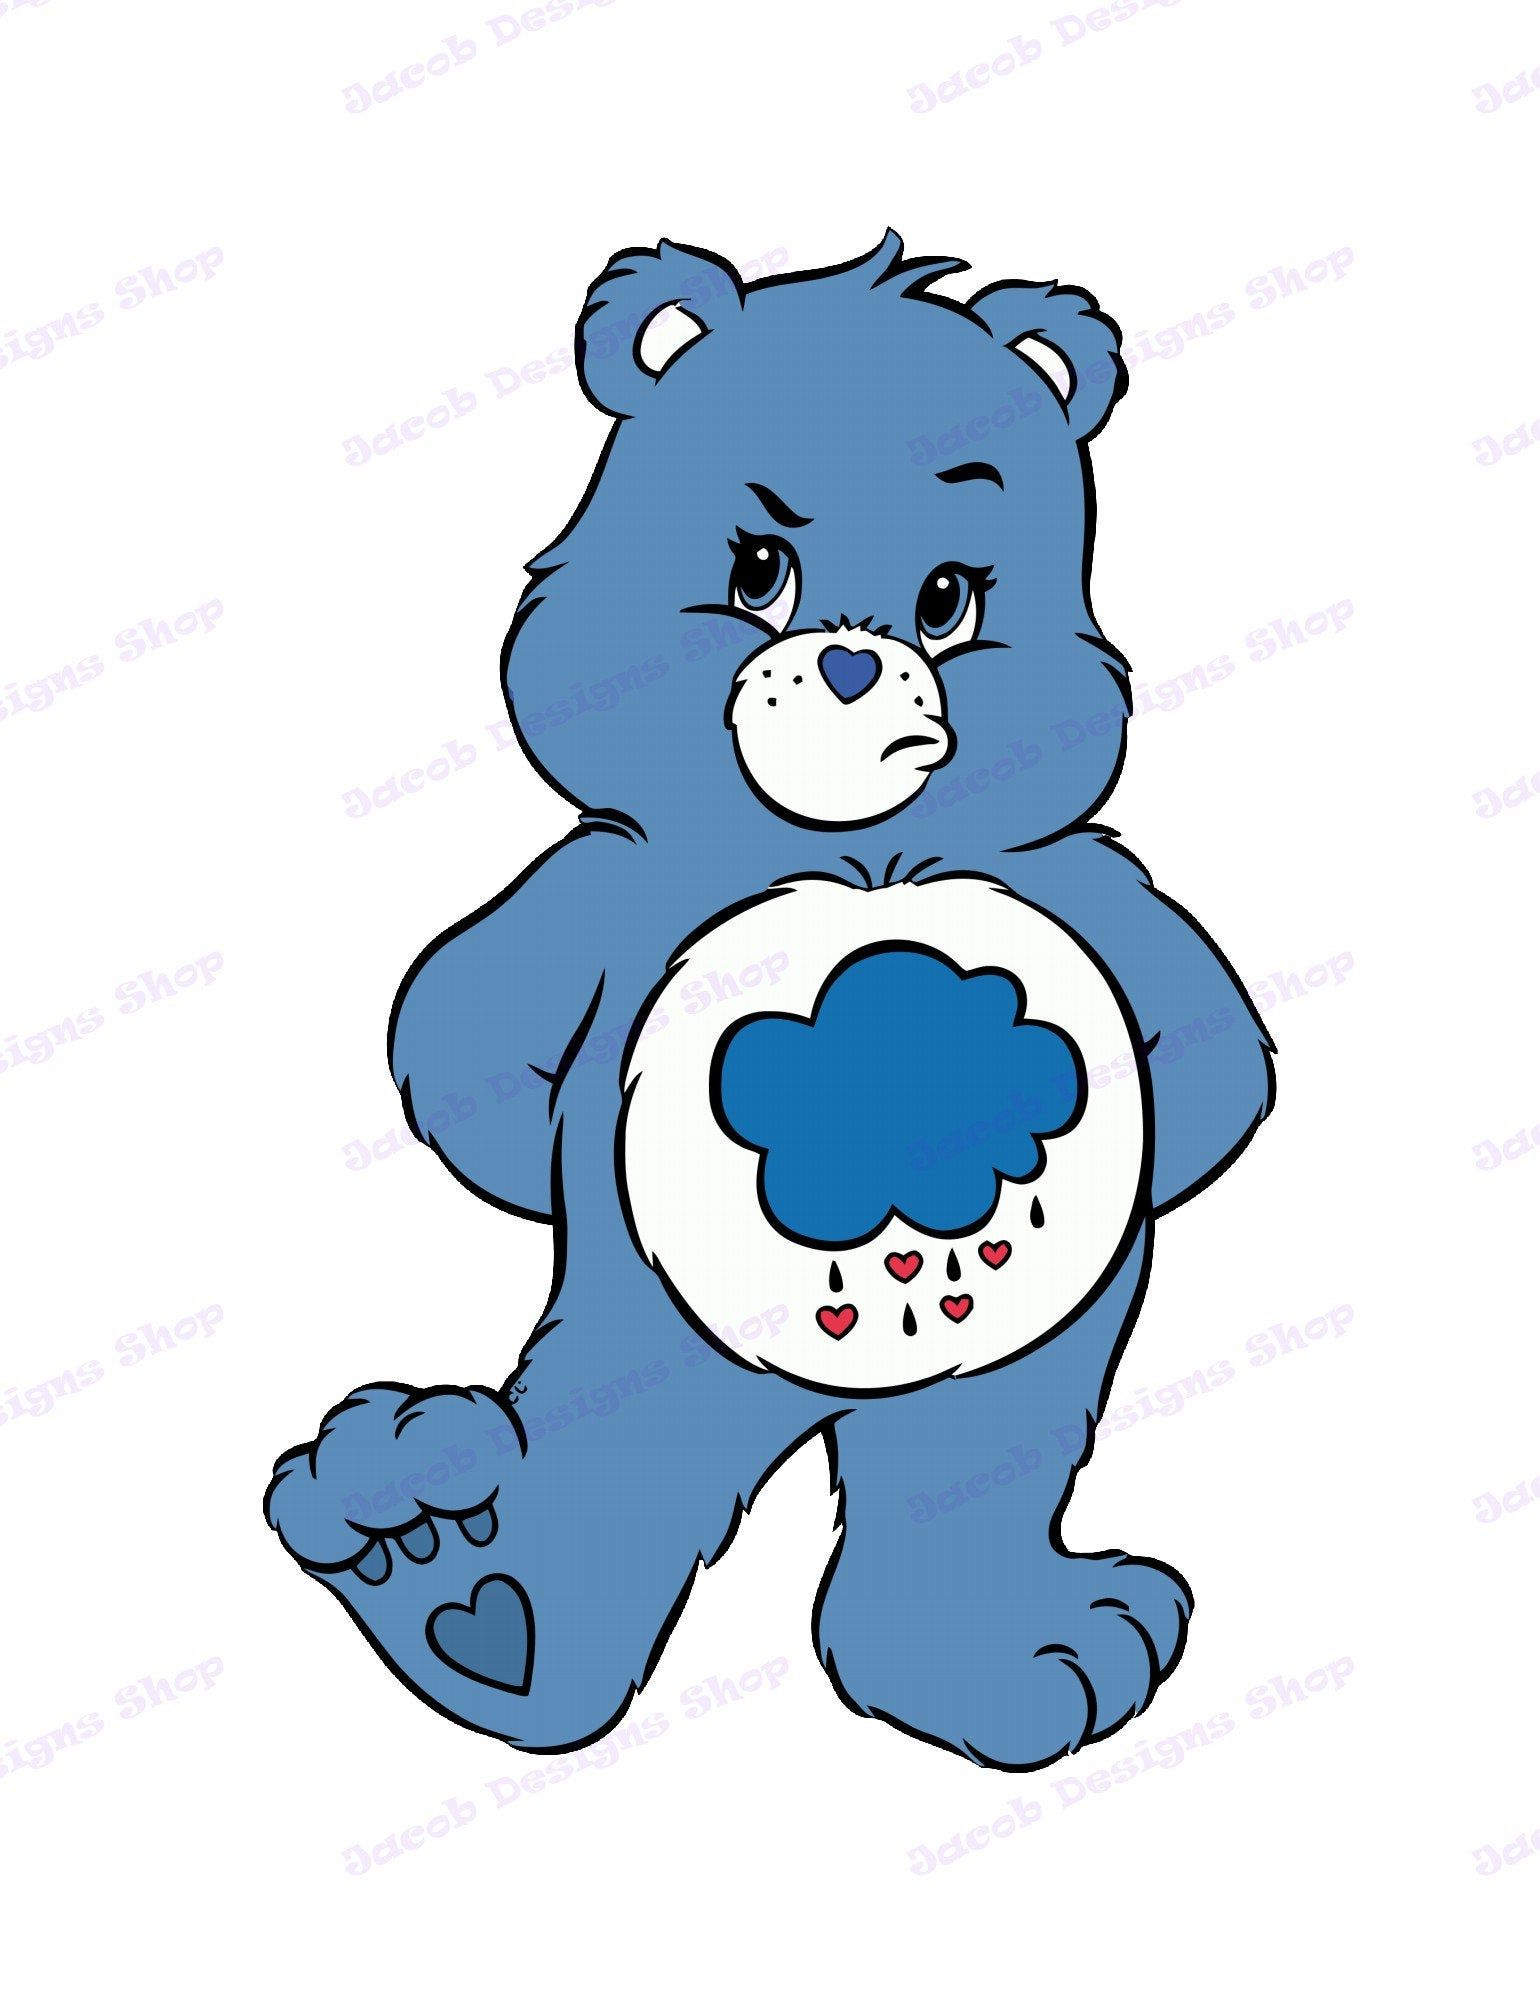 Care Bears SVG 30, svg, dxf, Cricut, Silhouette Cut File, Instant Download